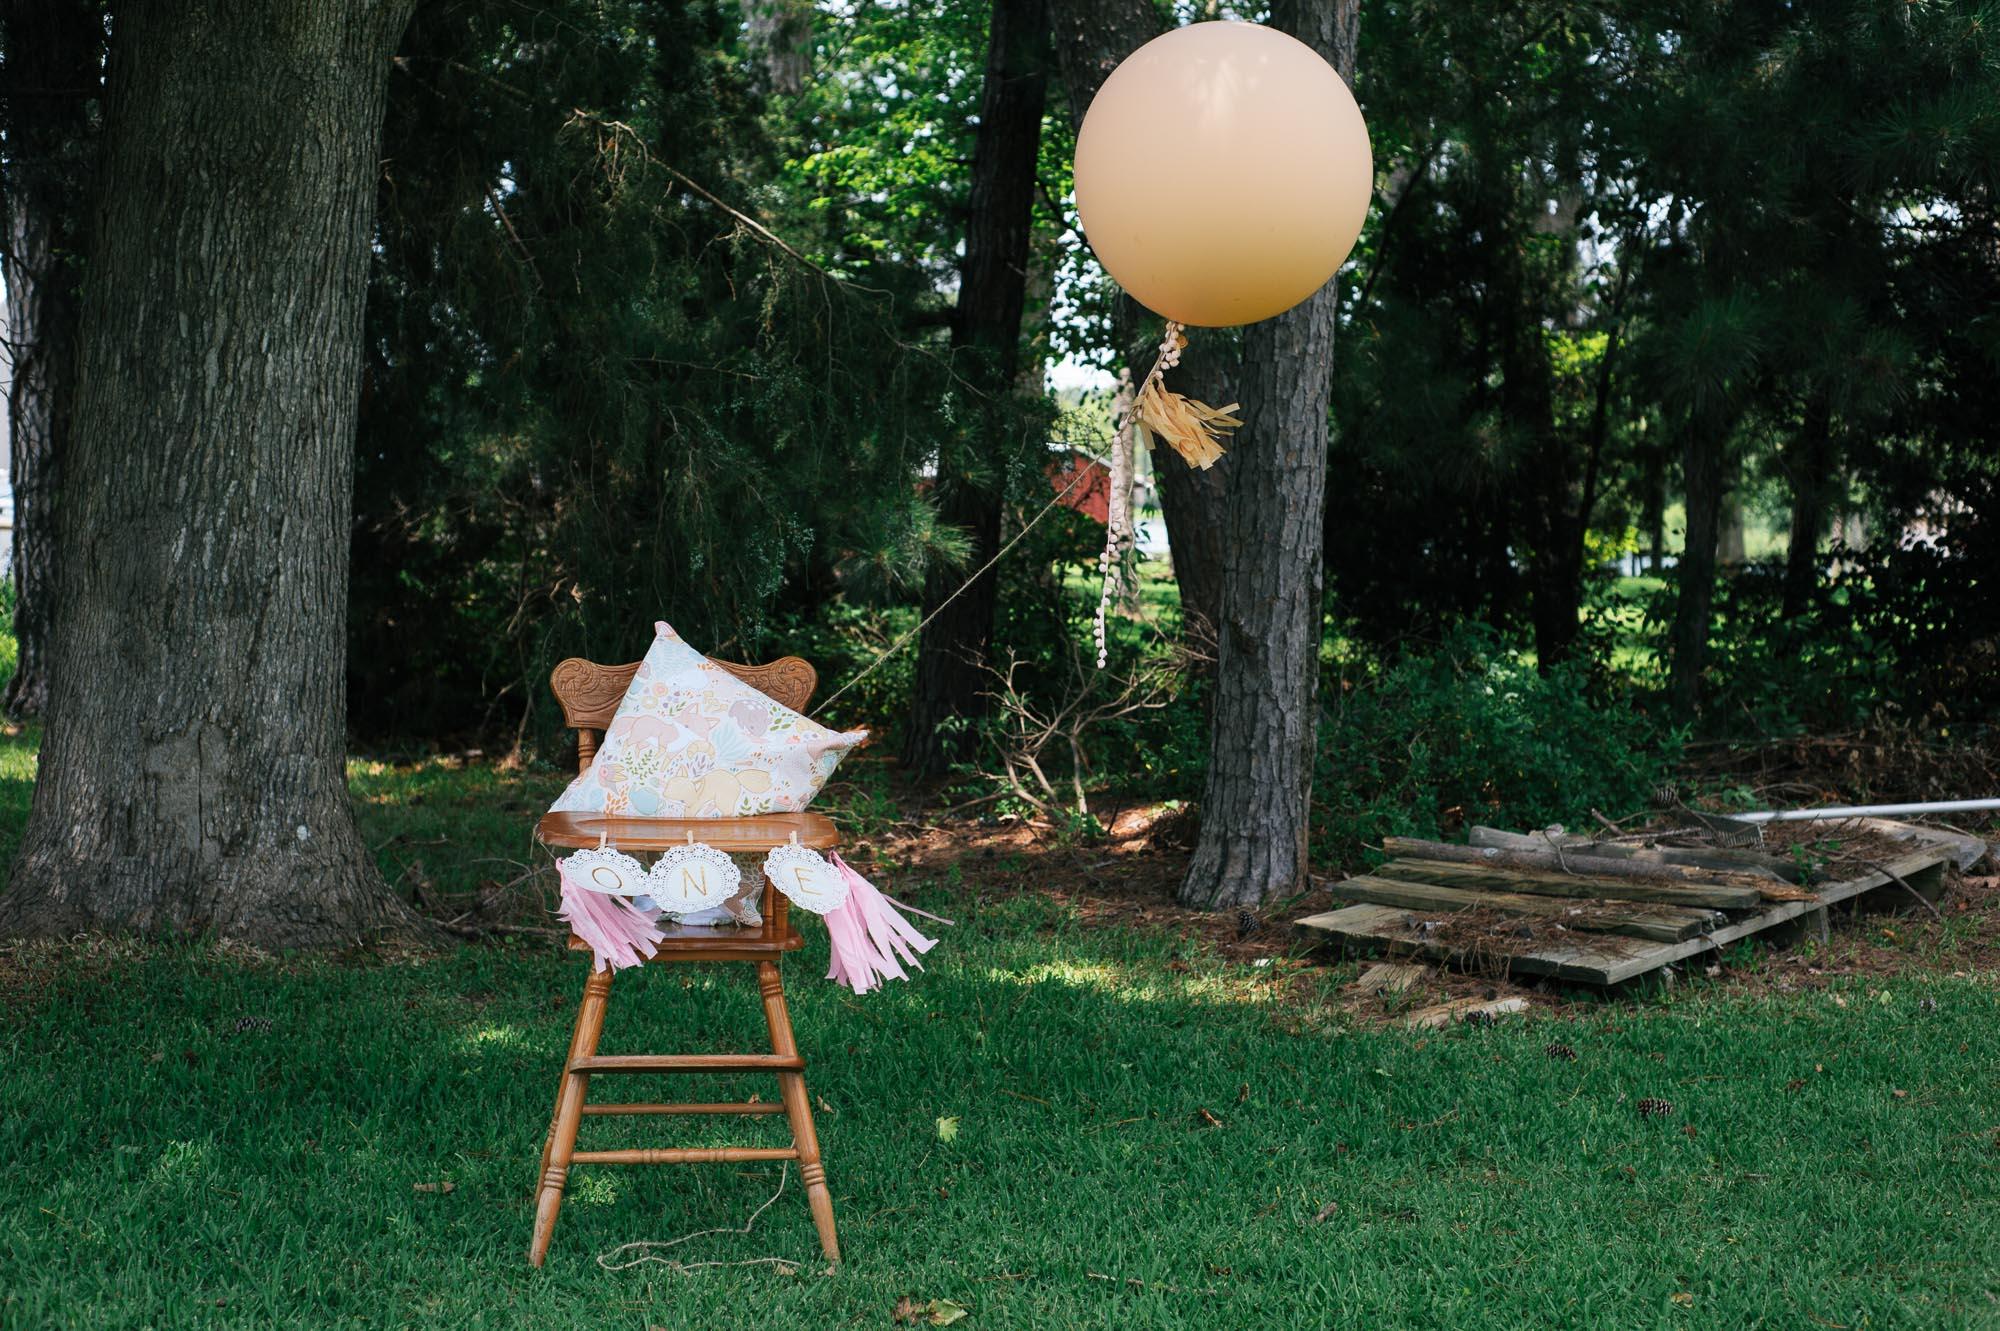 m.newsom-photography-one-year-old-girls-birthday-party-ideas-alice-in-wonderland (35 of 42).jpg